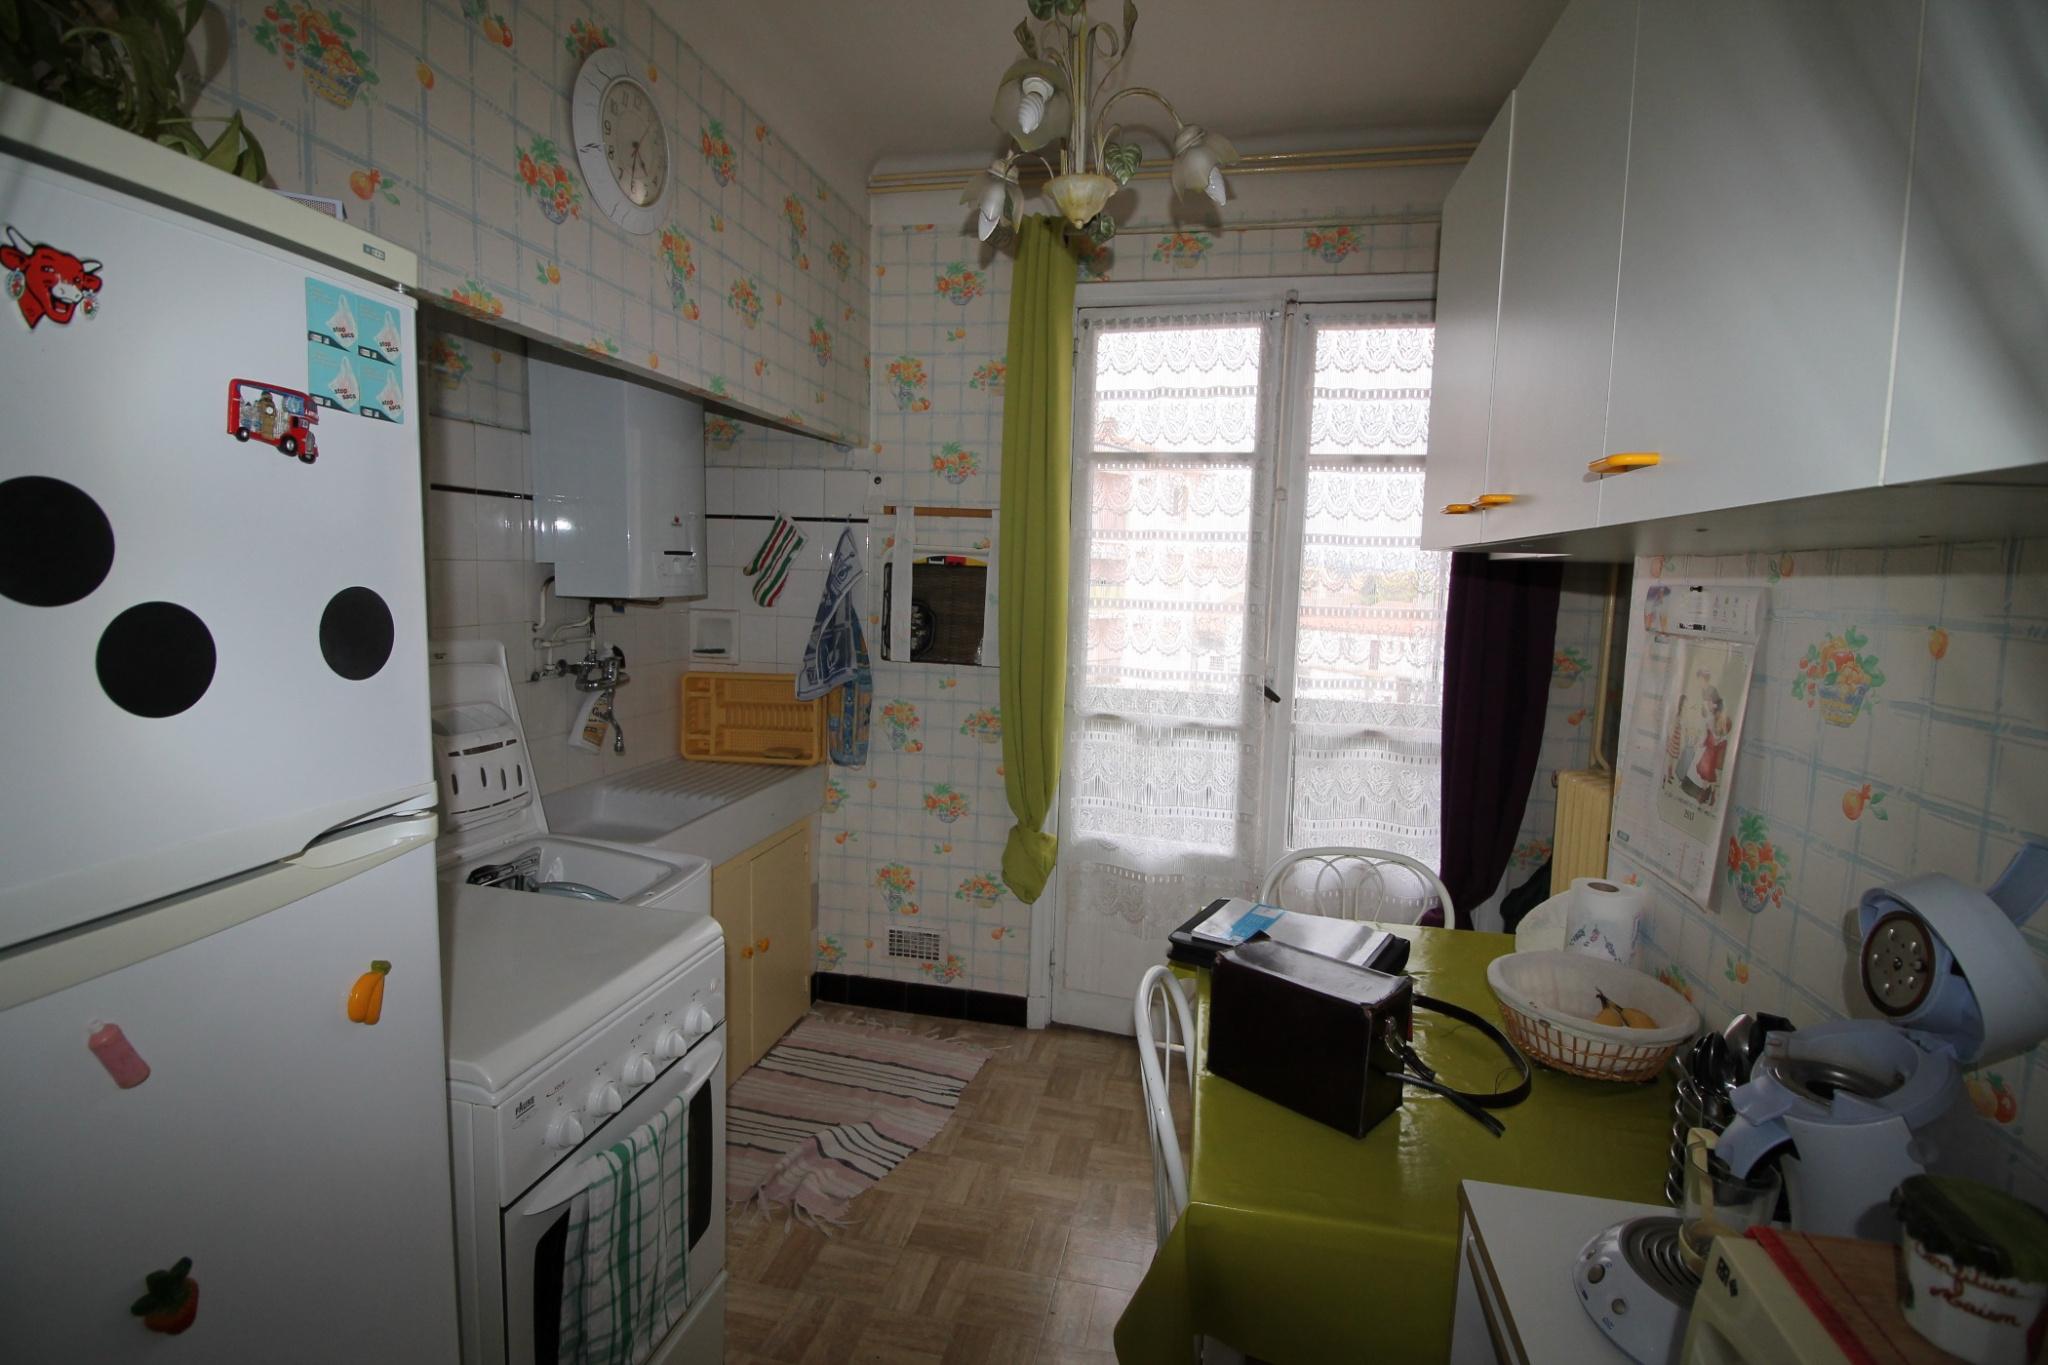 vente appartement lou type 4 dans r sidence agr able balcons et parking. Black Bedroom Furniture Sets. Home Design Ideas